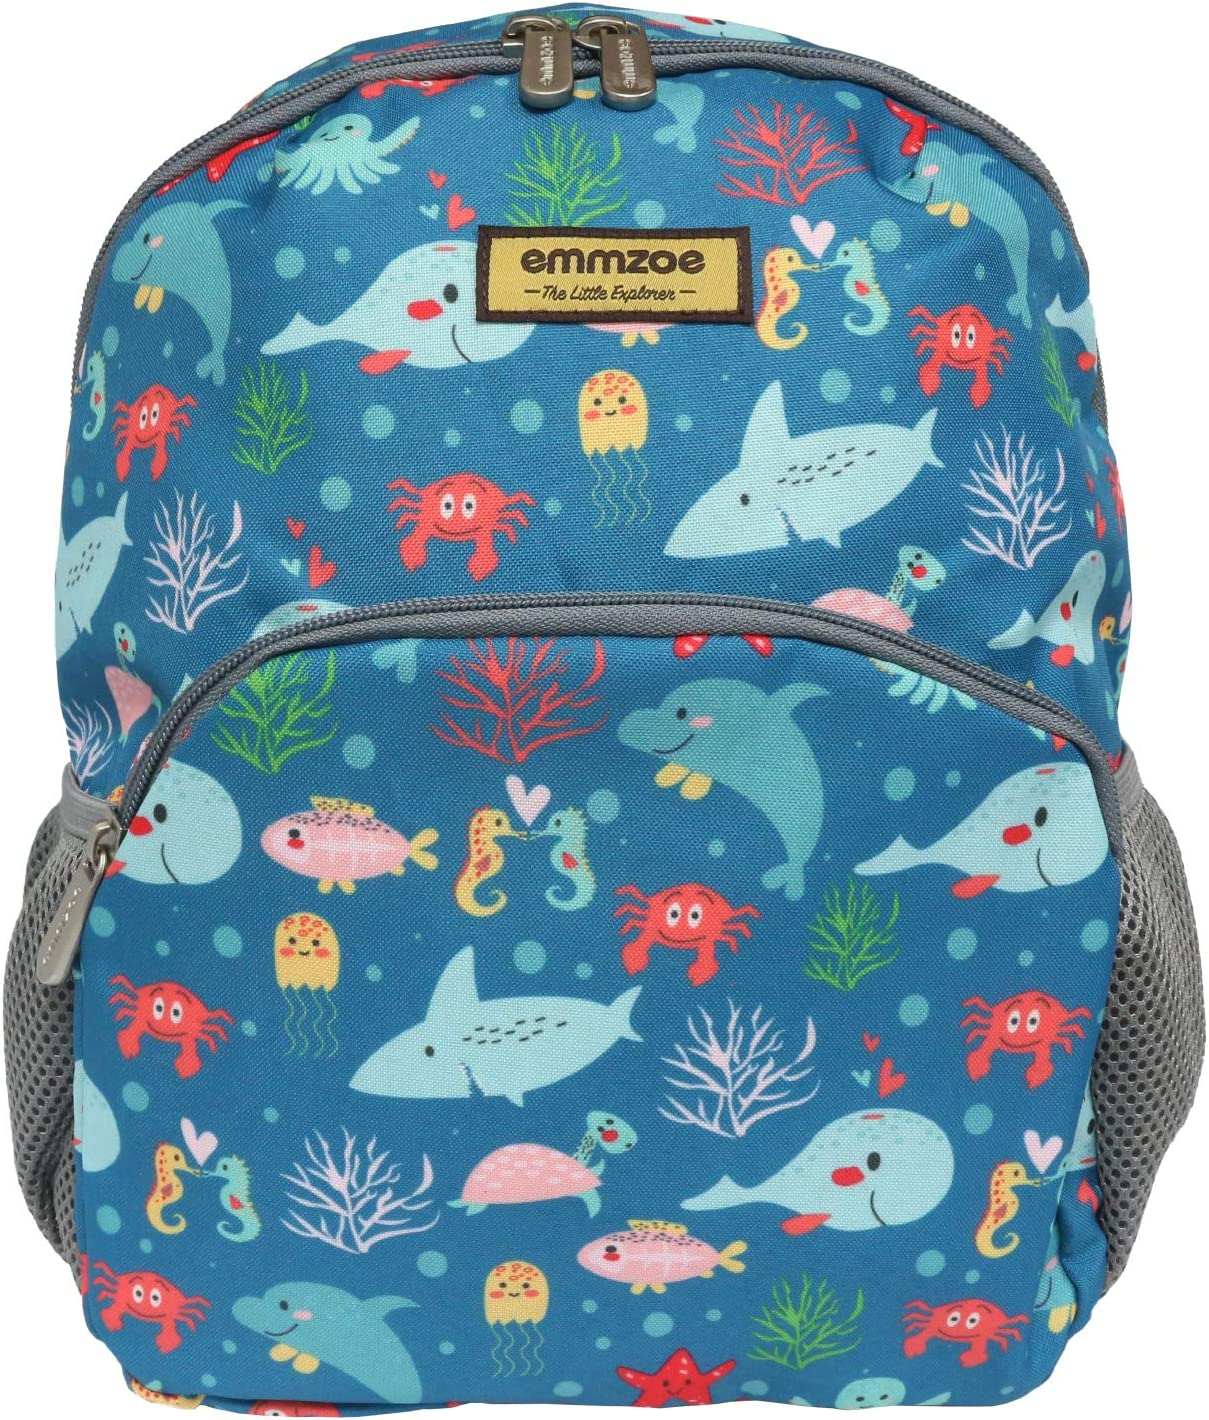 Emmzoe Little Explorer Mini Toddler & Kids Backpack - Lightweight Fits Lunch, Table, Food, Books (Sea Animals)